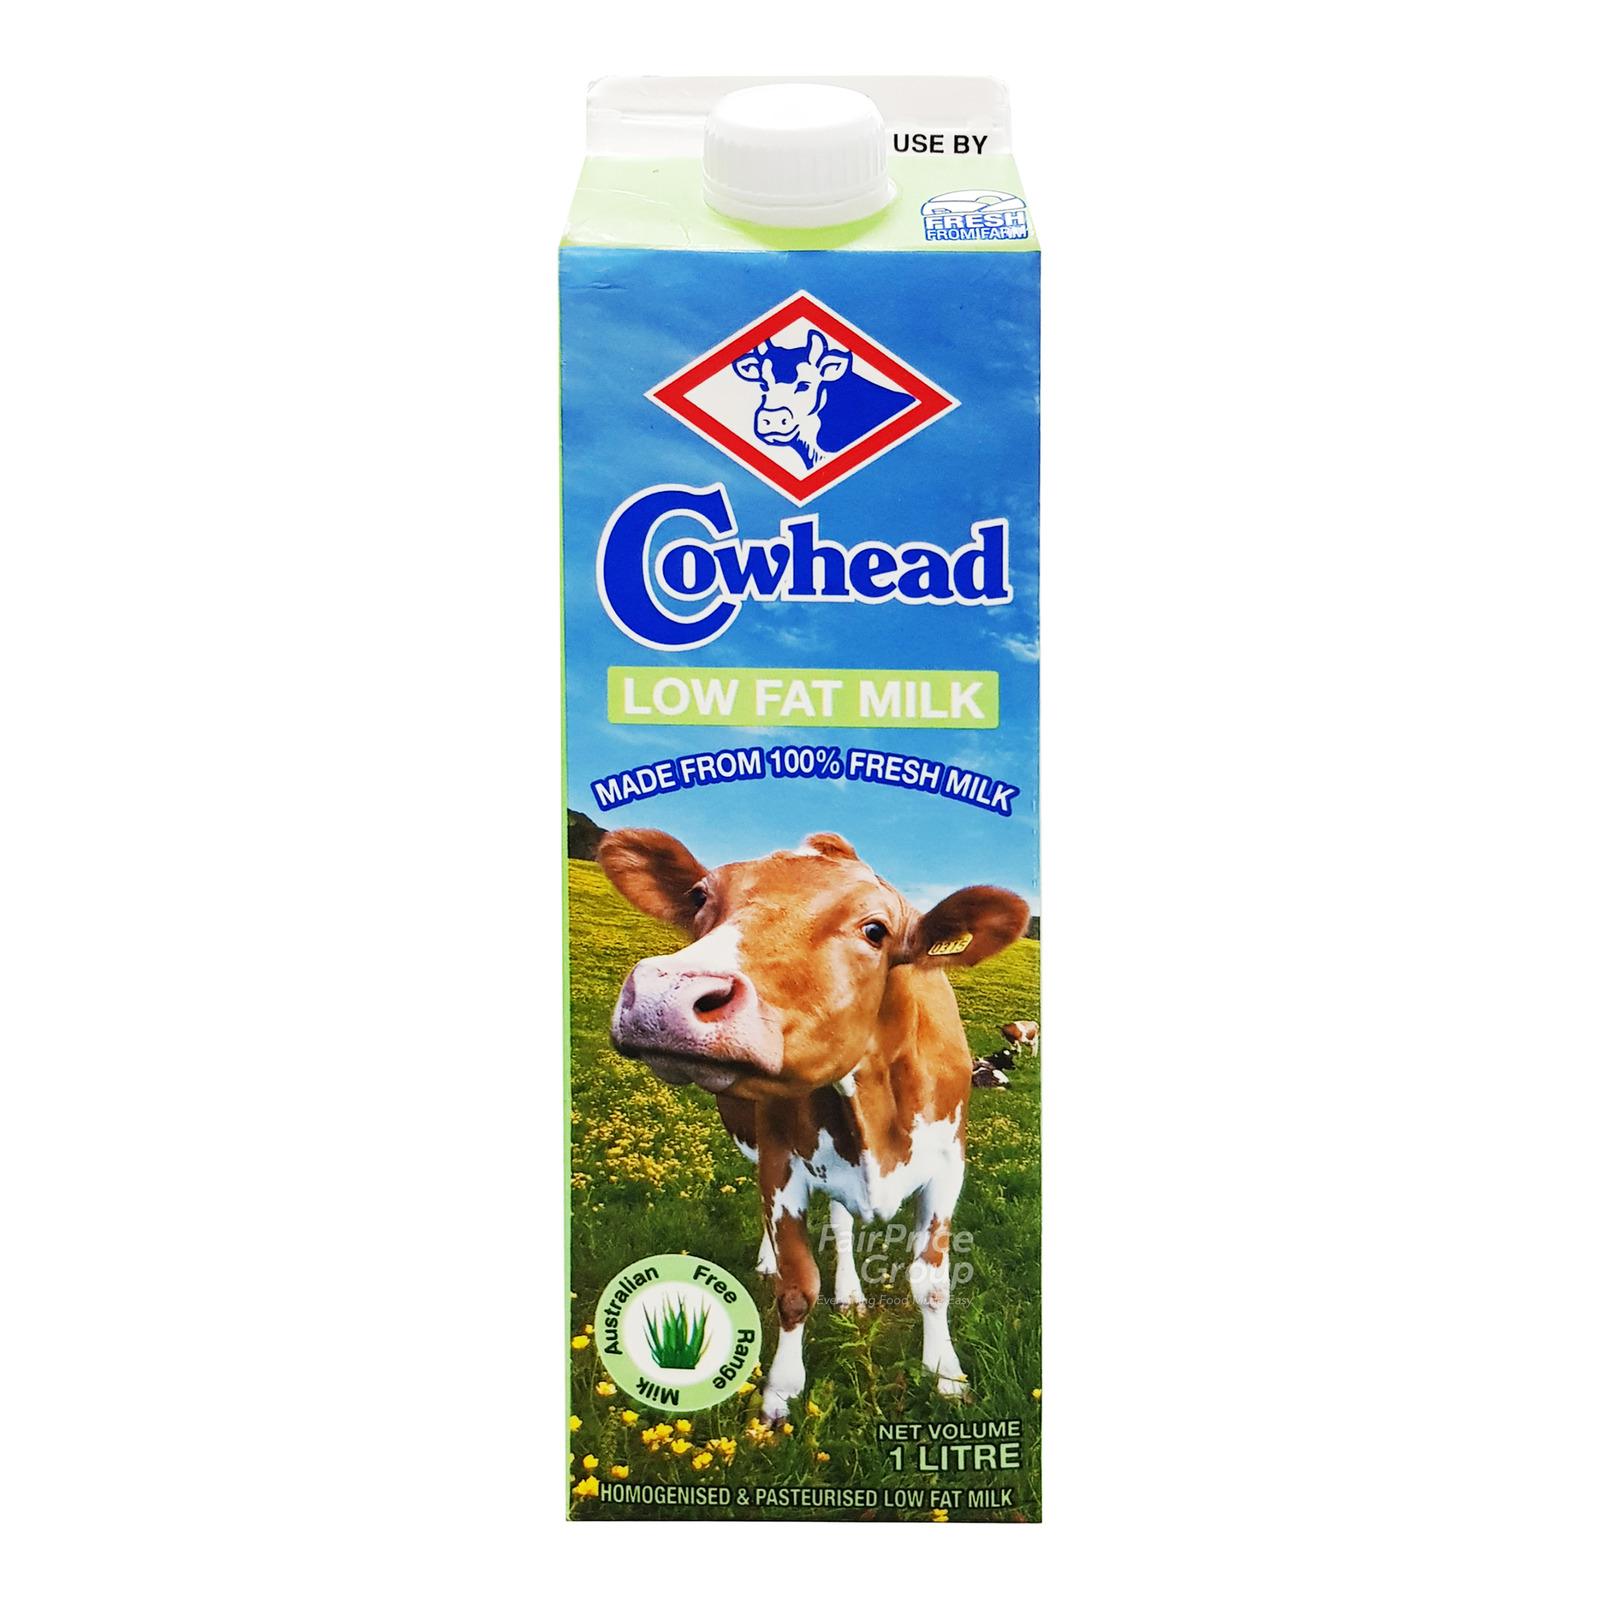 Cowhead 100% Fresh Milk - Low Fat